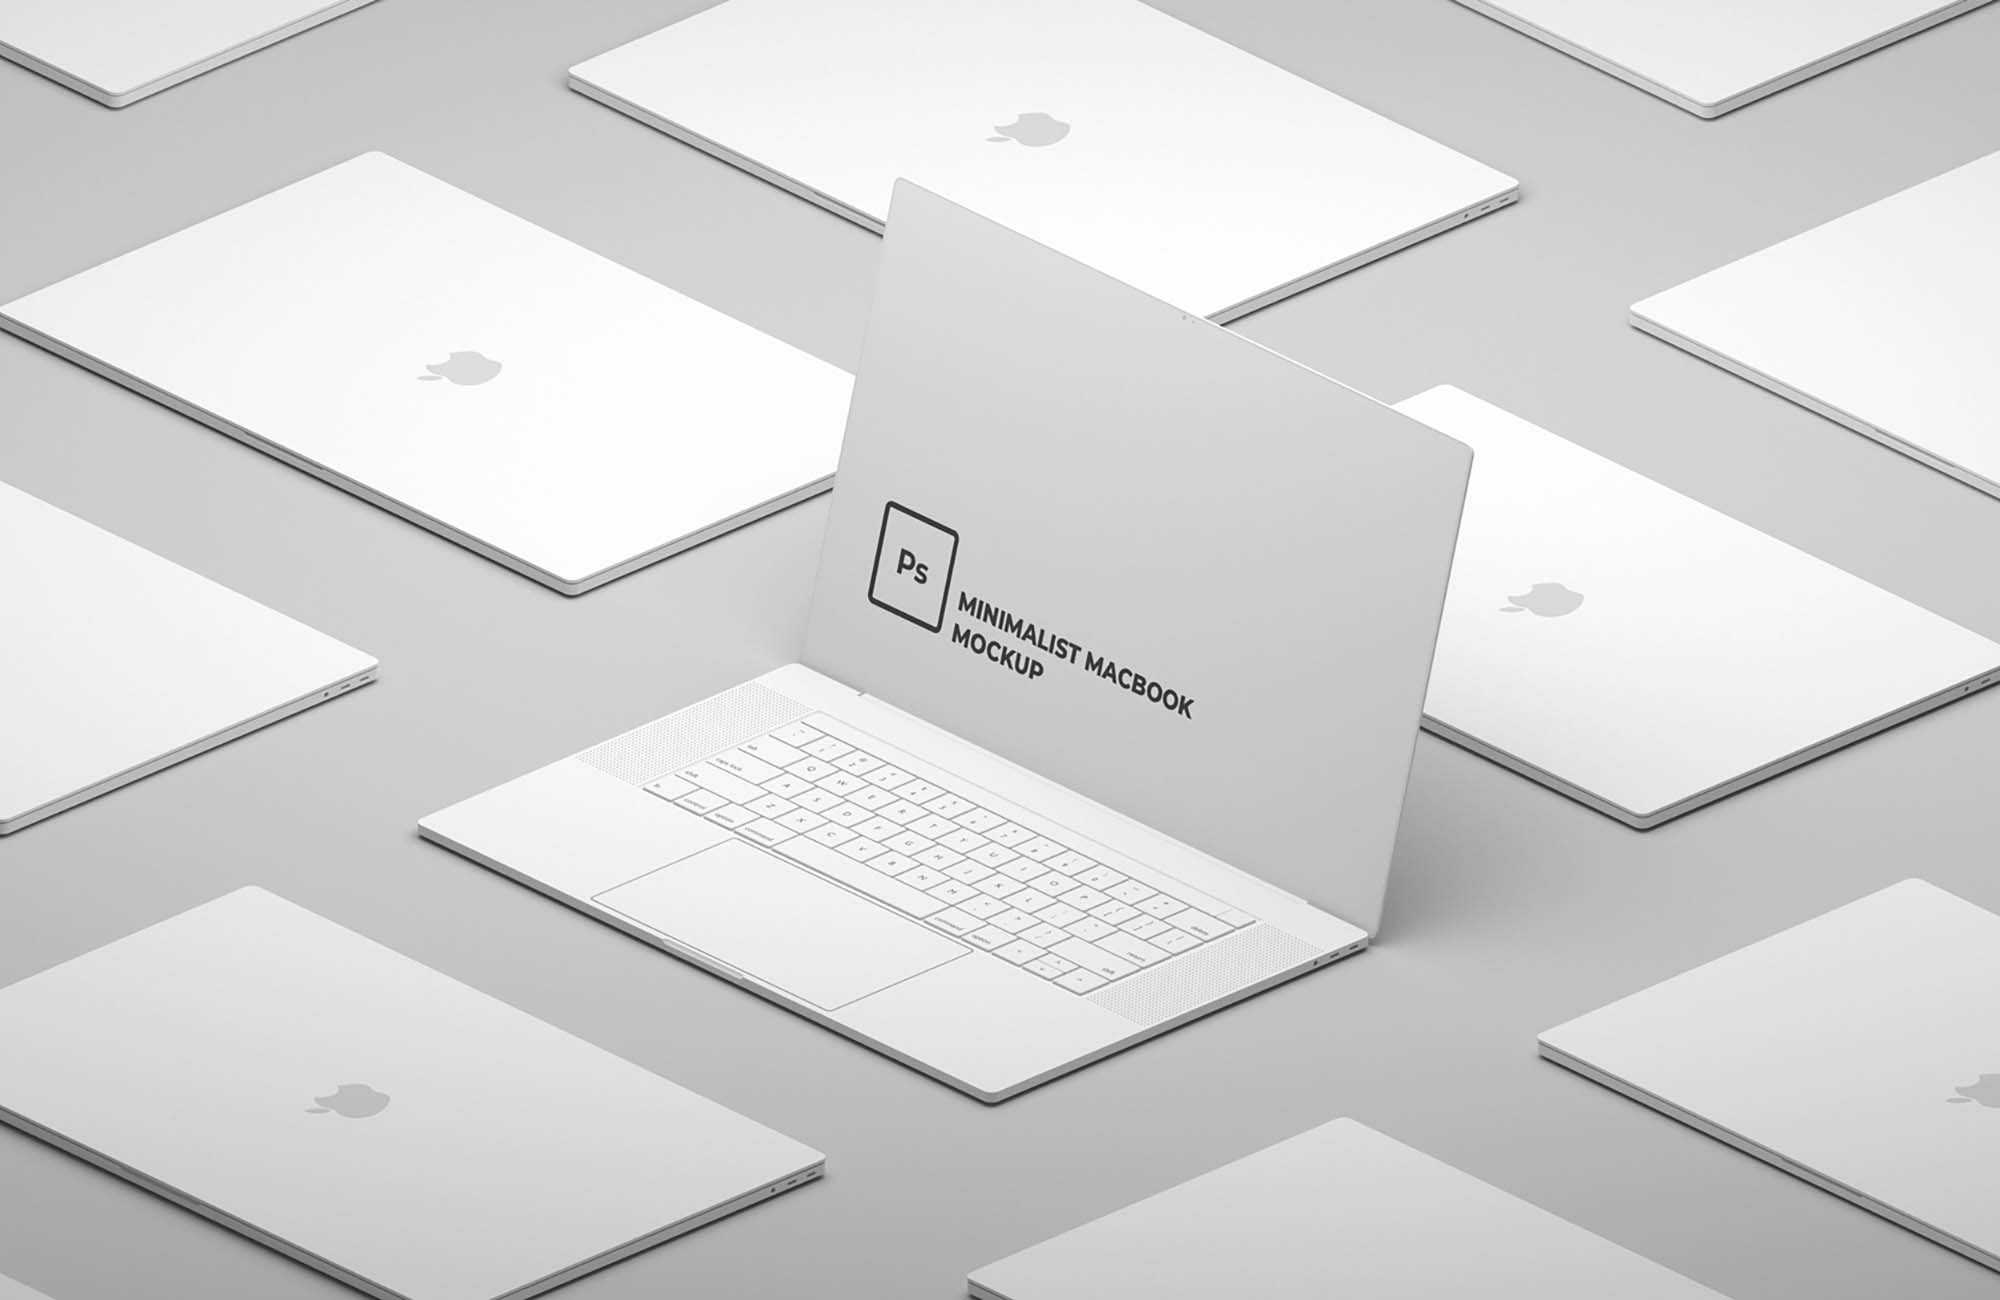 Minimalist Macbook Mockup